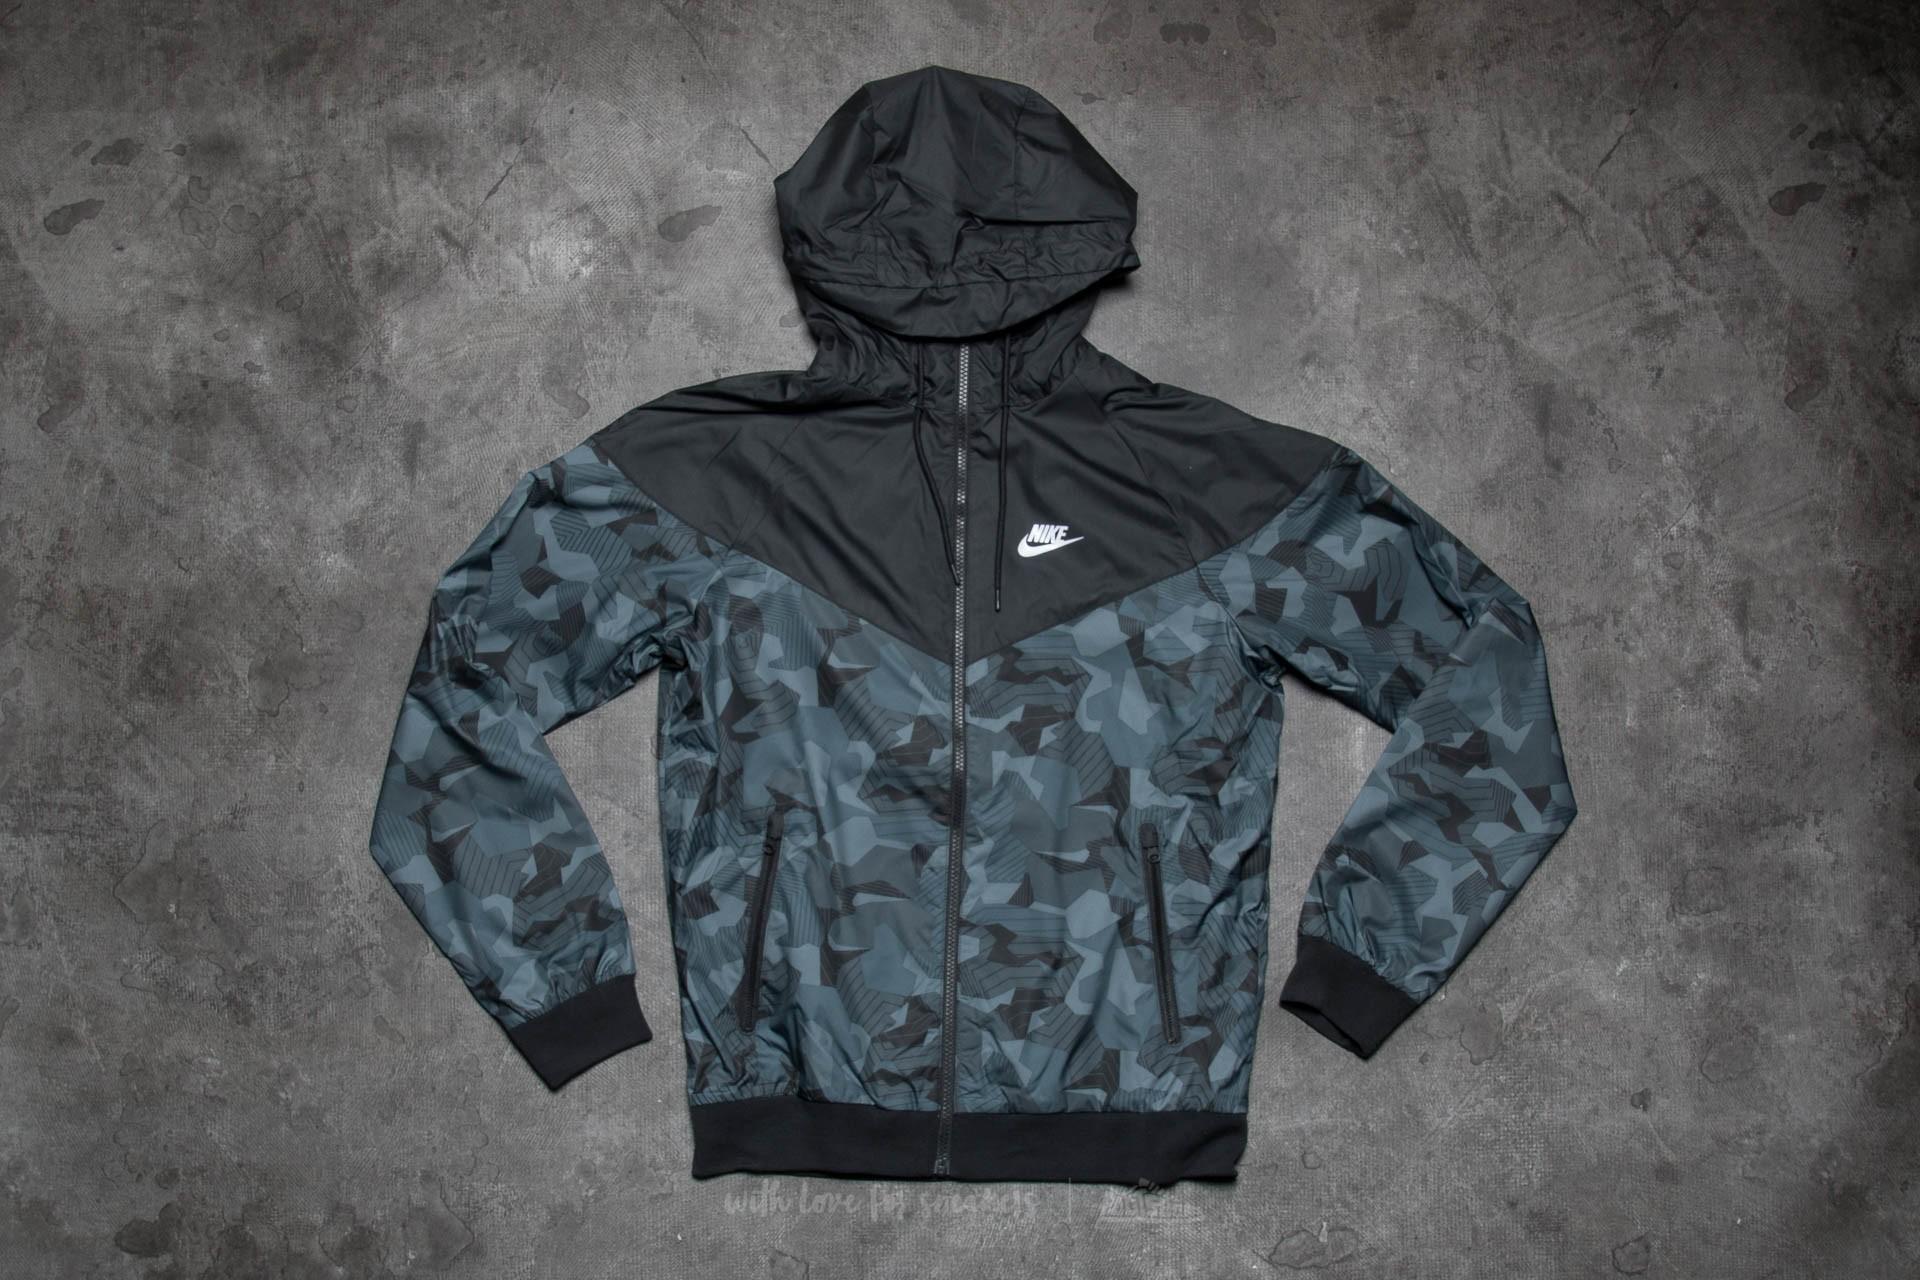 c5cee02e1a83 Nike Sportswear Windrunner AOP Badlands Black  White